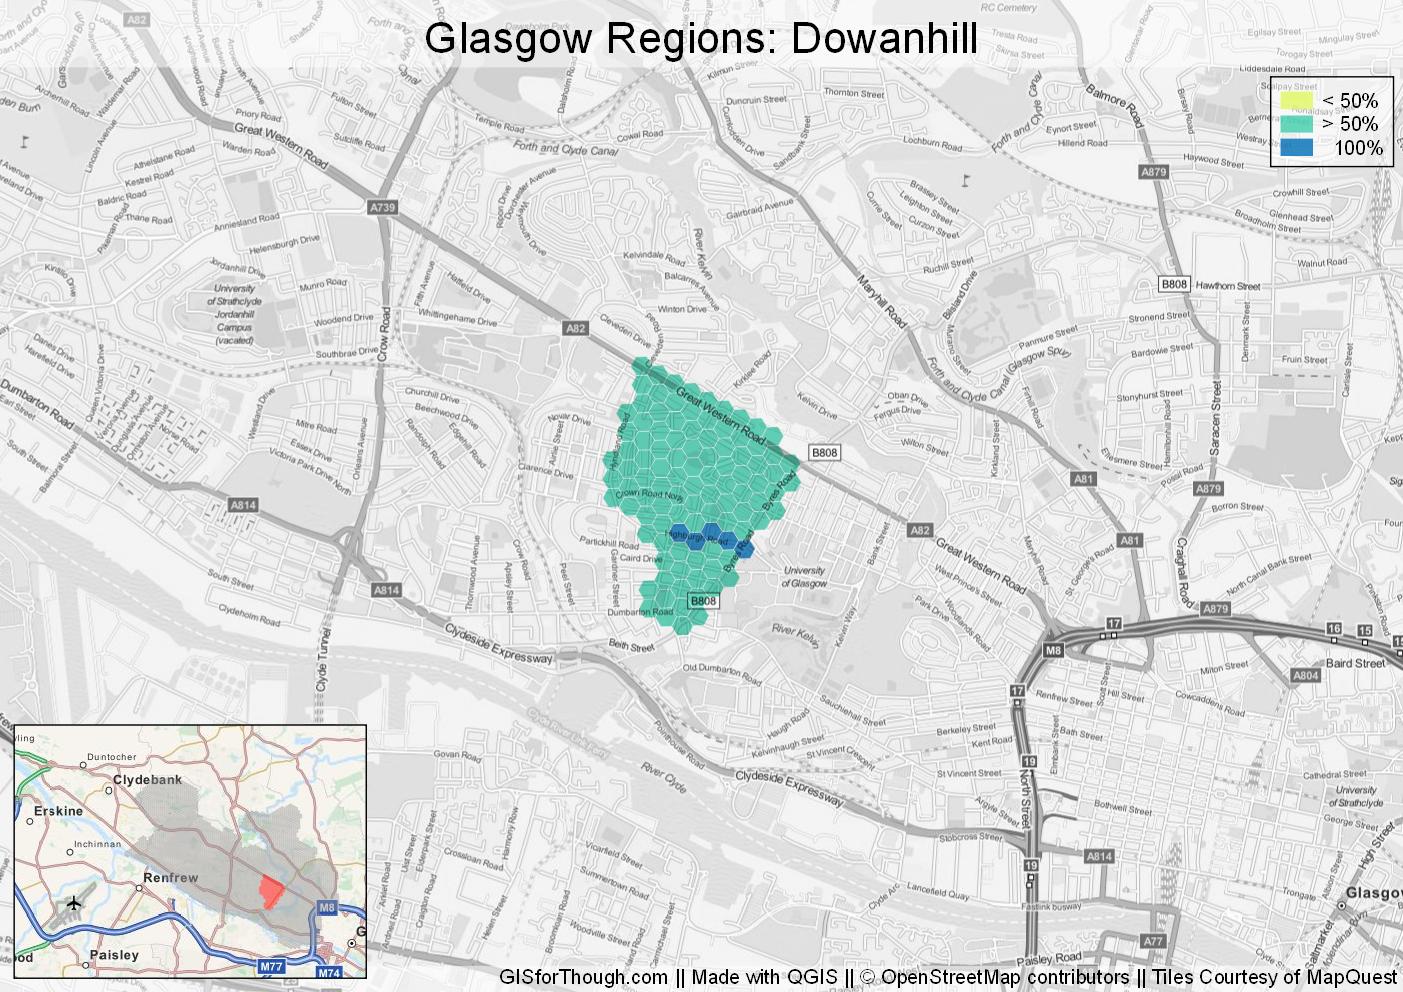 Dowanhill